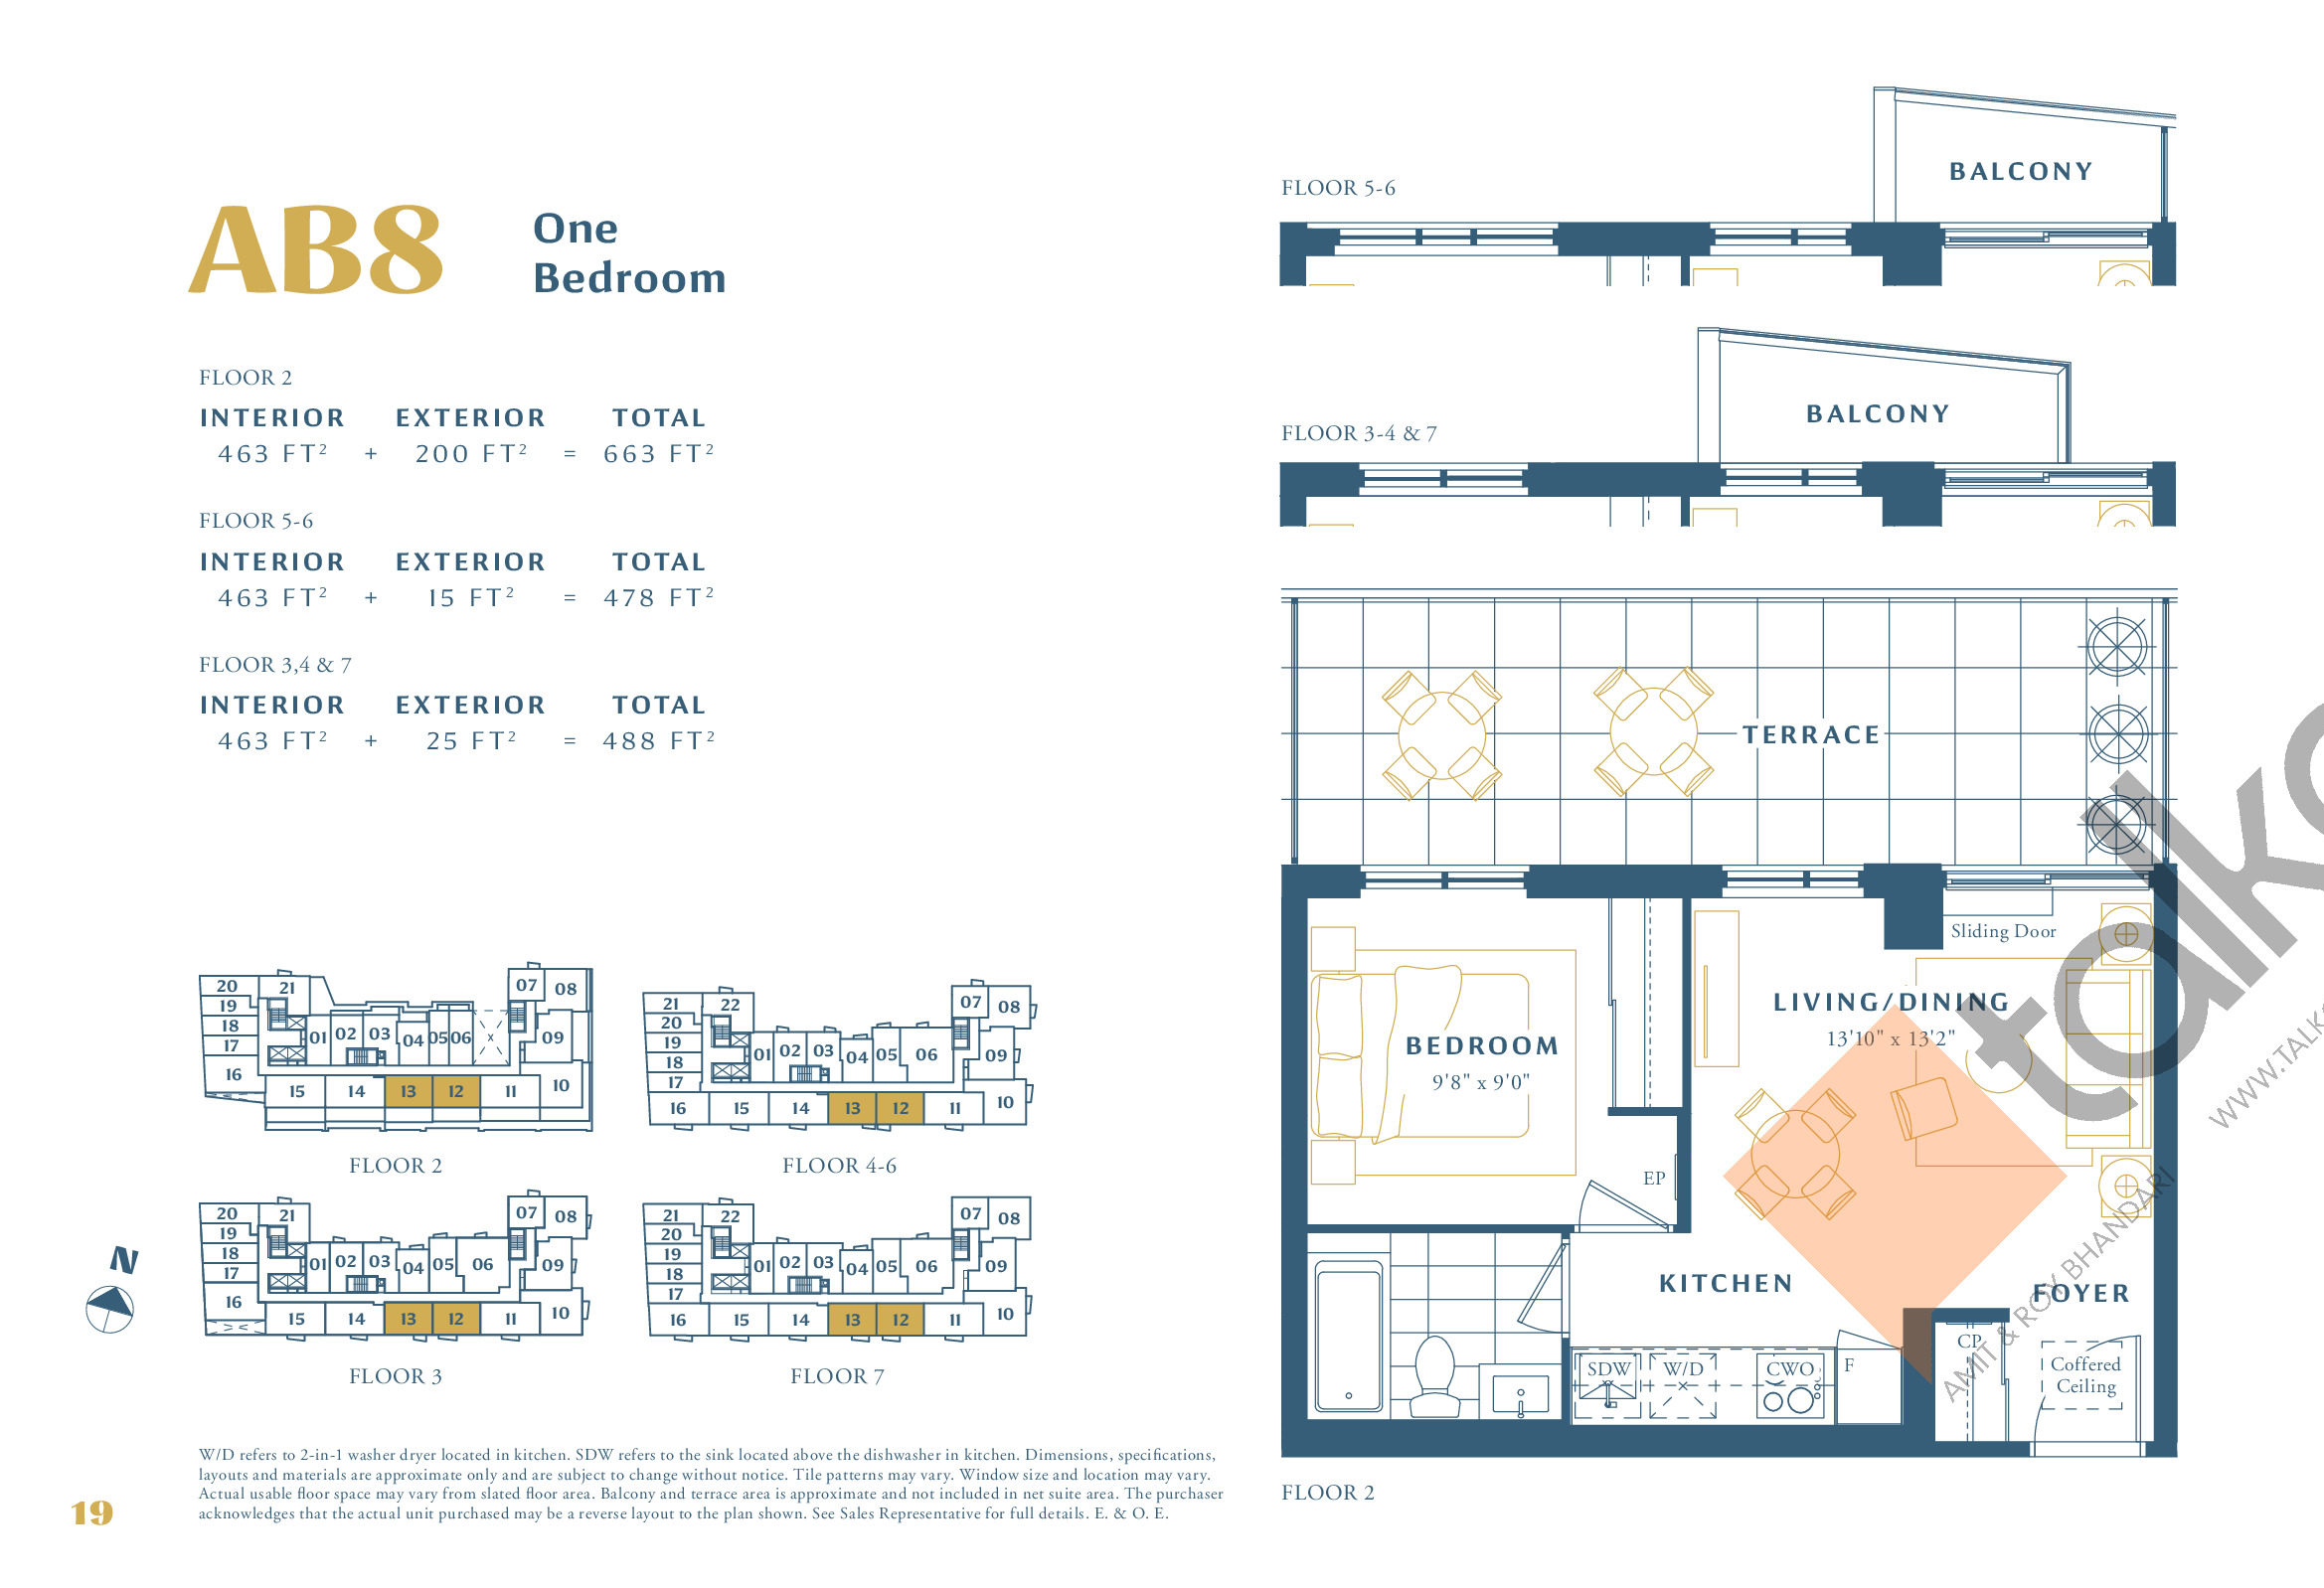 AB8 Floor Plan at The Borough Condos - Tower A - 463 sq.ft